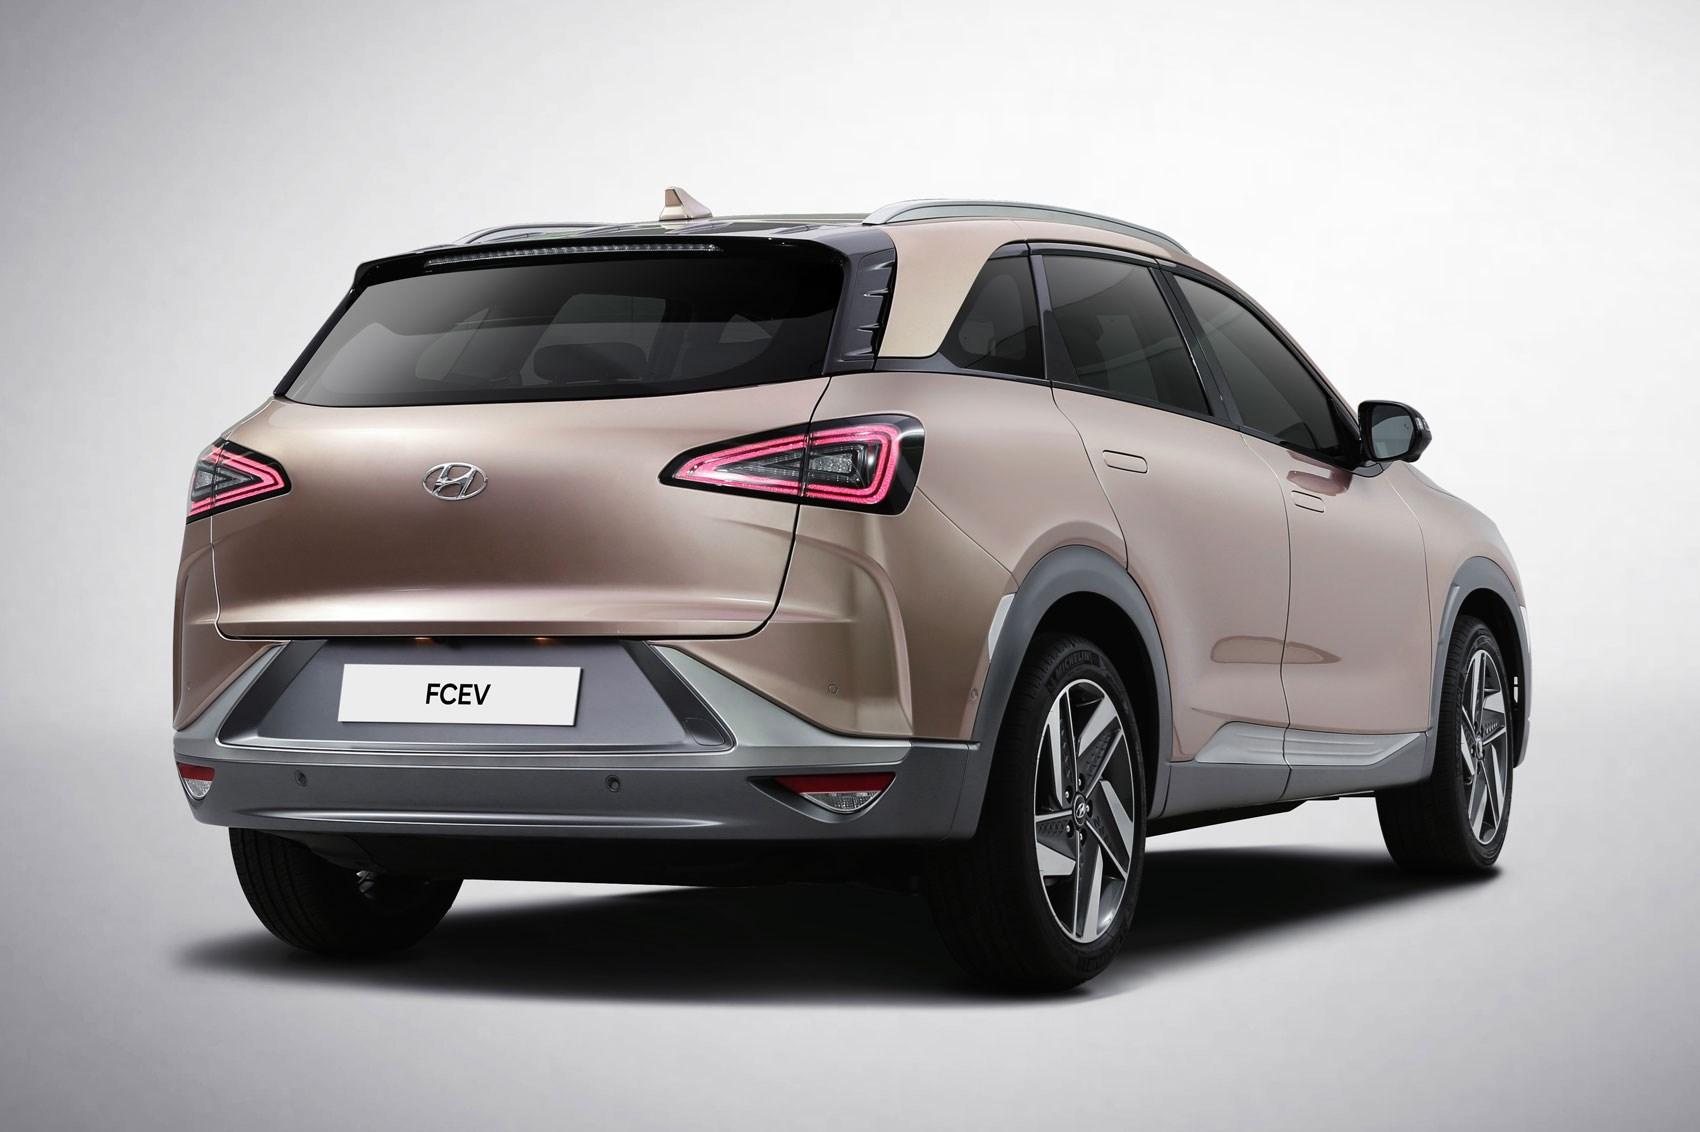 new hyundai nexo hydrogen suv heading for uk in january 2019 car magazine. Black Bedroom Furniture Sets. Home Design Ideas